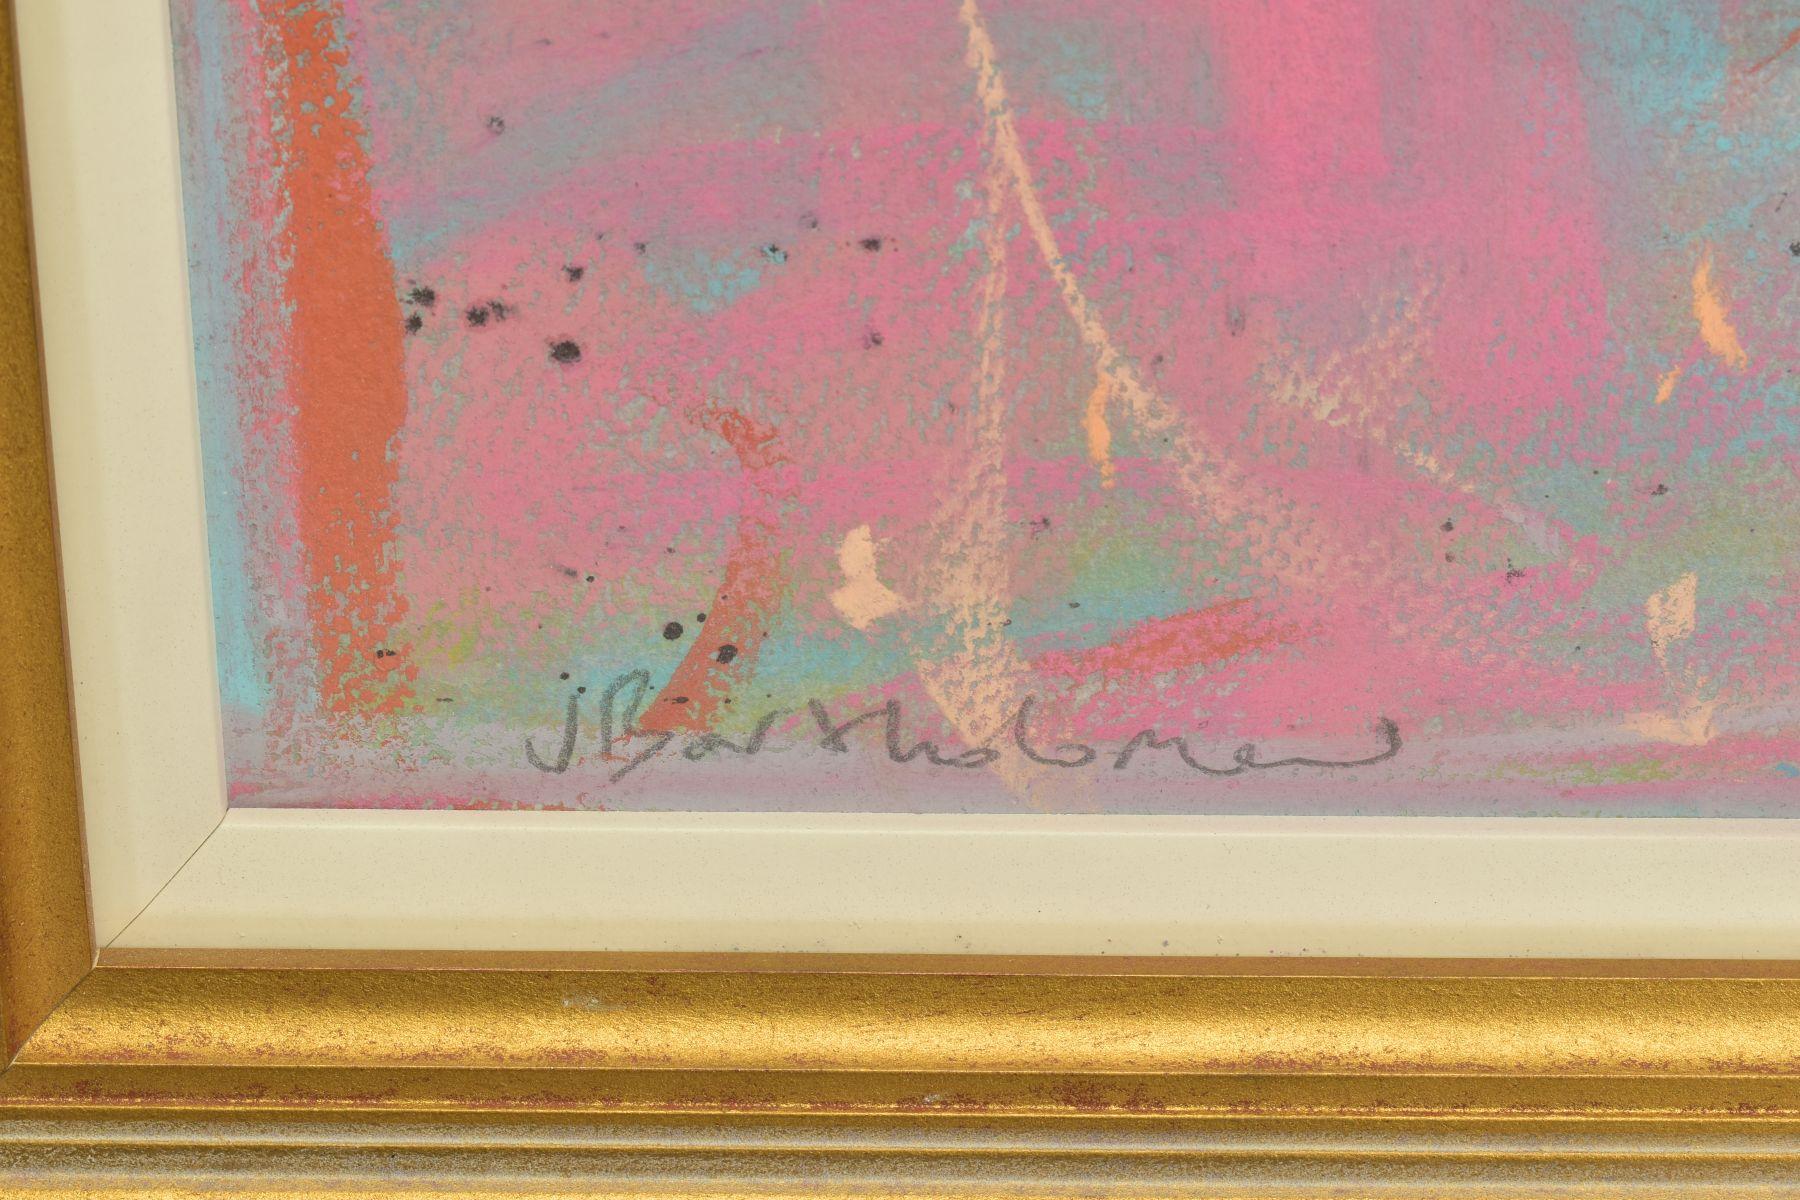 JAMES BARTHOLOMEW (BRITISH CONTEMPORARY), 'Woodpigeons and Rooster', signed bottom left, mixed media - Image 4 of 7